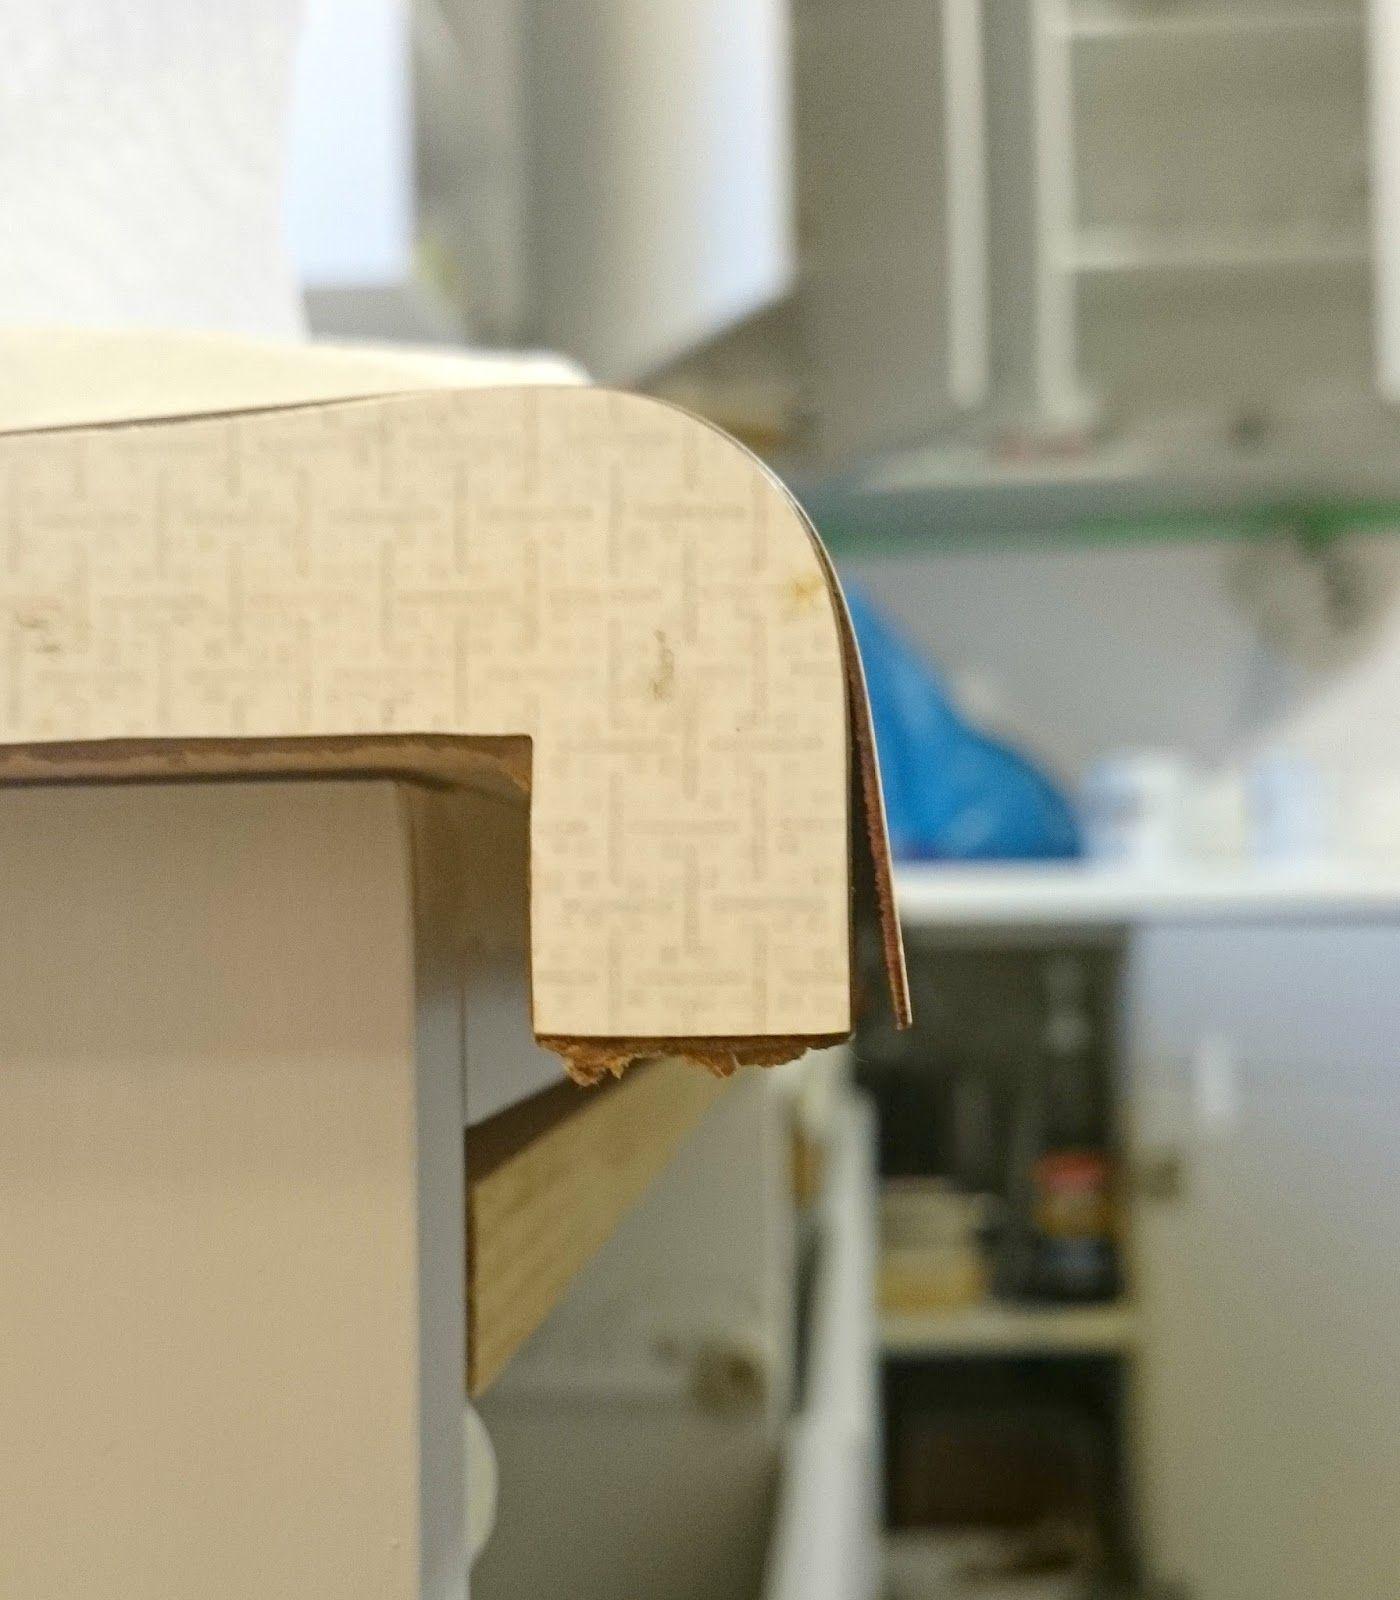 How To Repair And Refinish Laminate Counters Dans Le Lakehouse Laminate Counter Countertop Repair Refinish Countertops